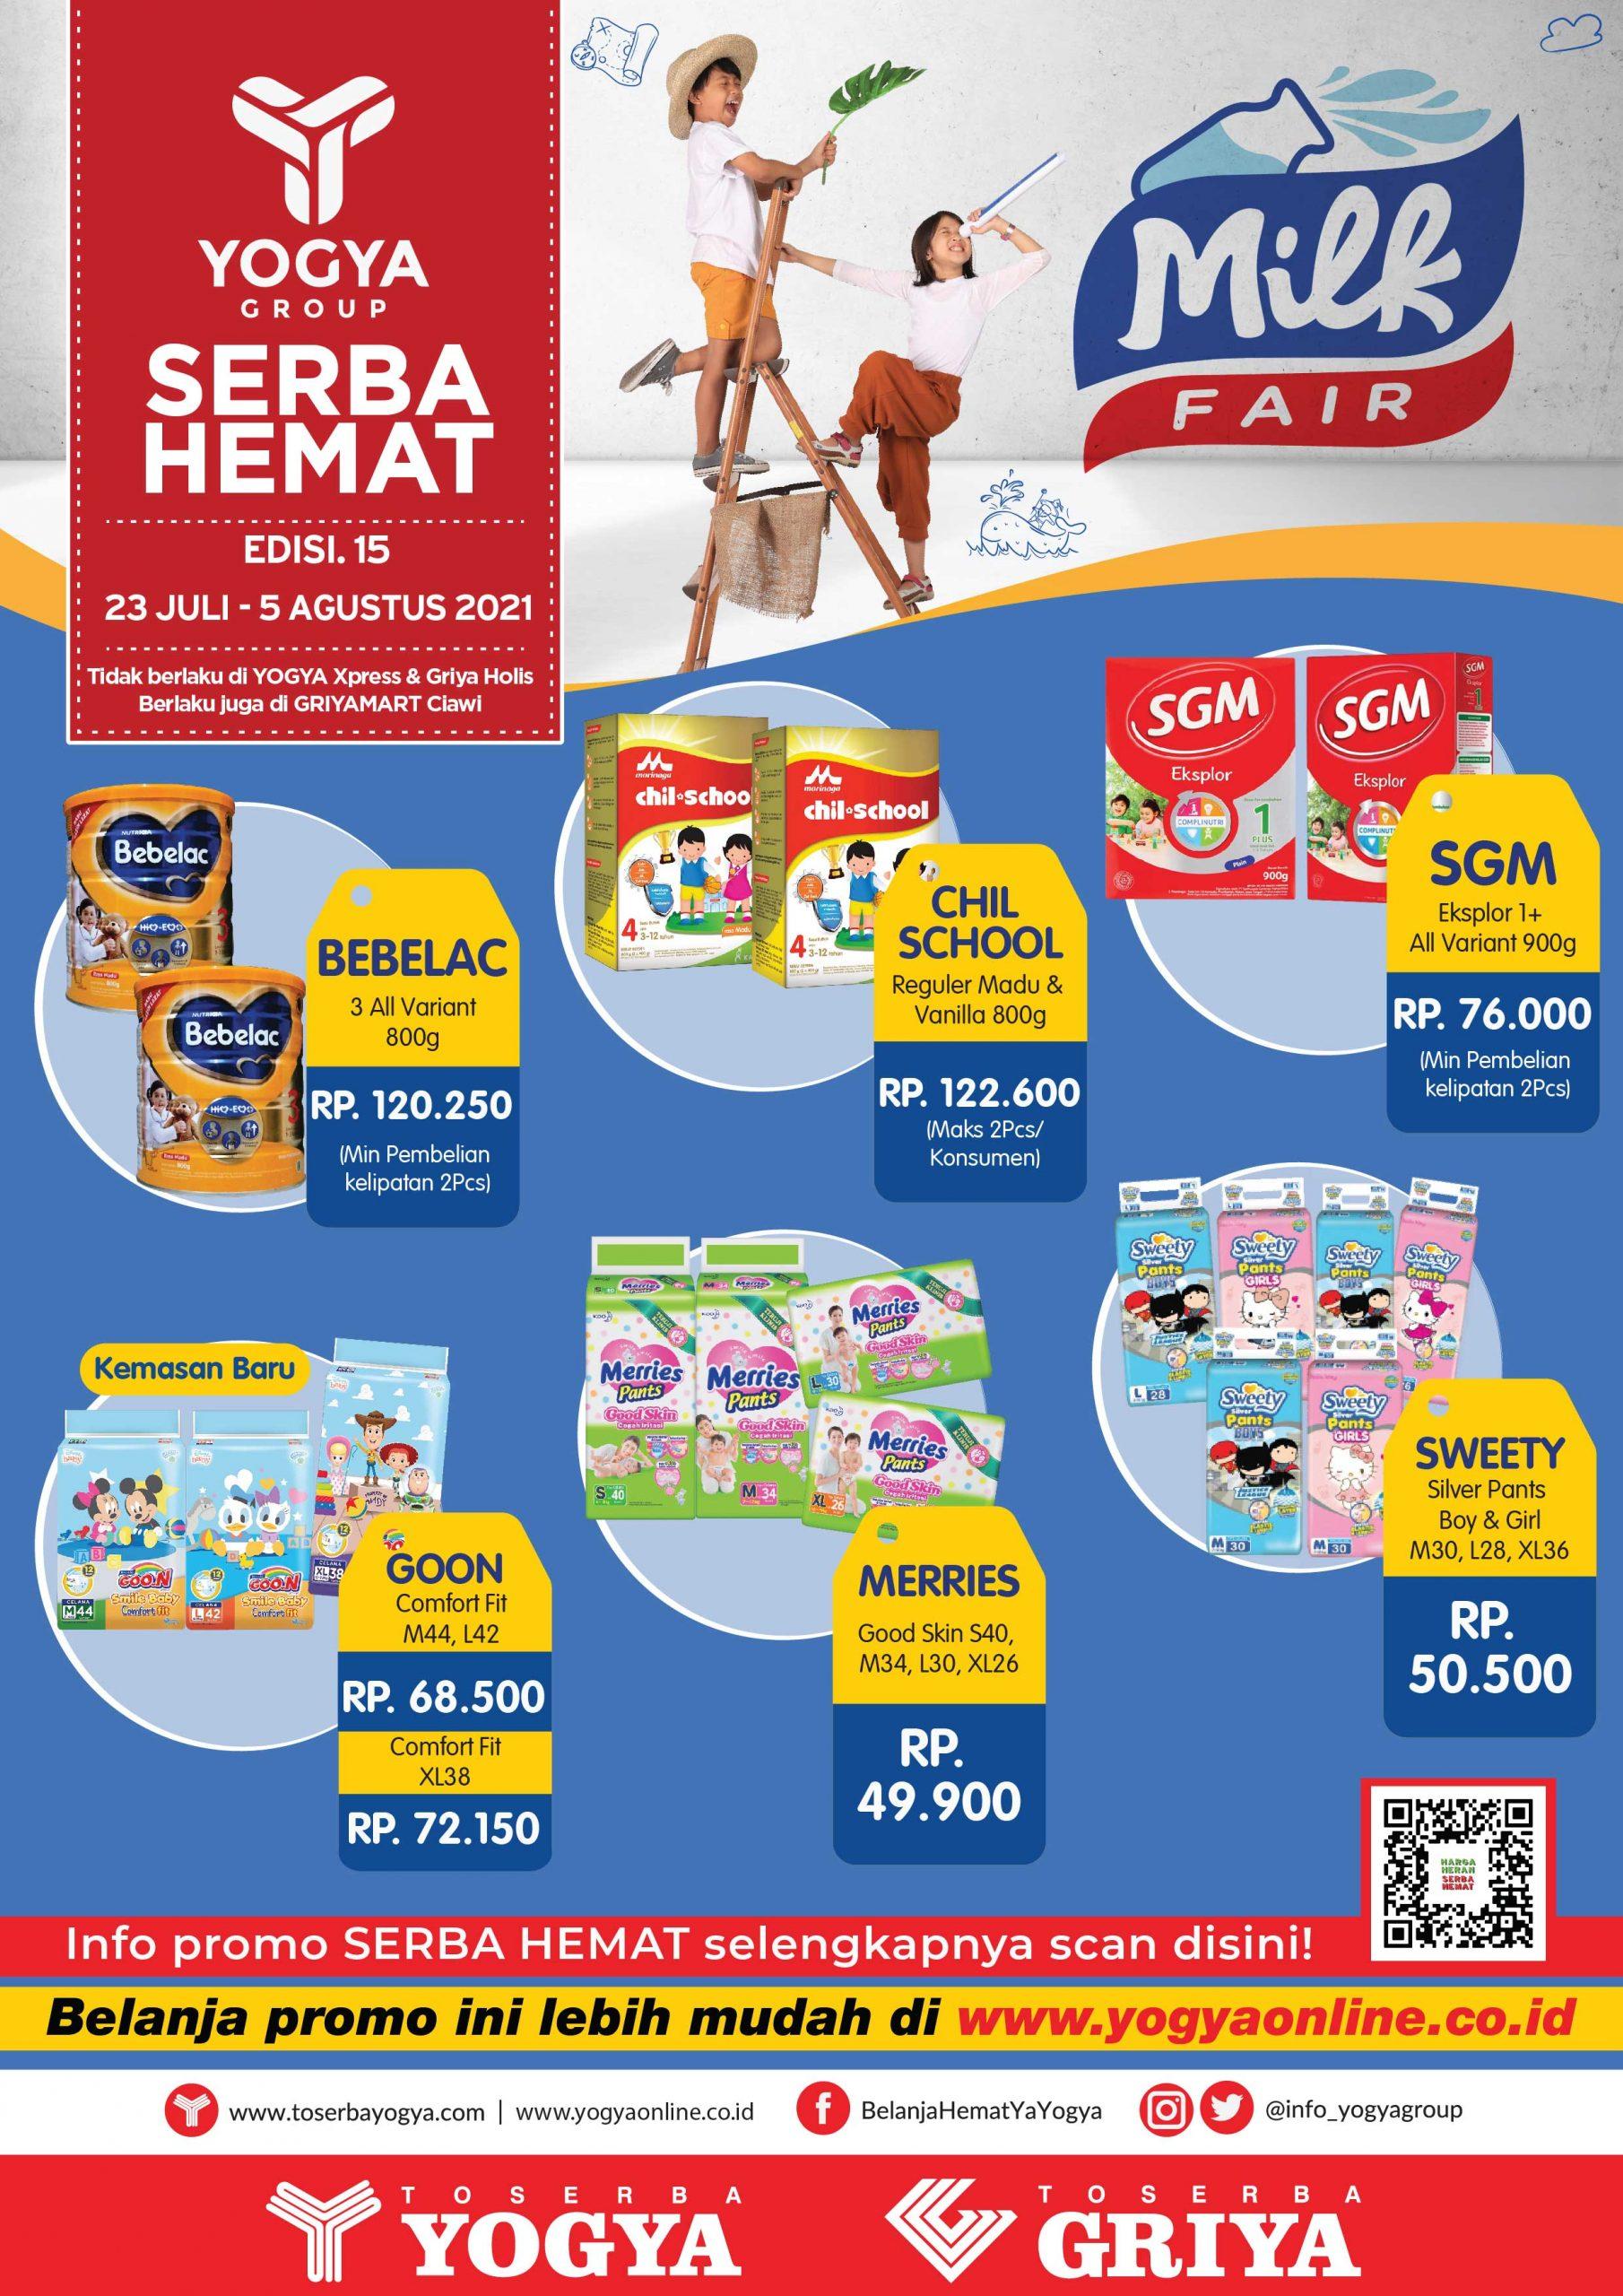 Katalog Toserba Yogya Promo SERBA HEMAT periode 23 Juli - 05 Agustus 2021